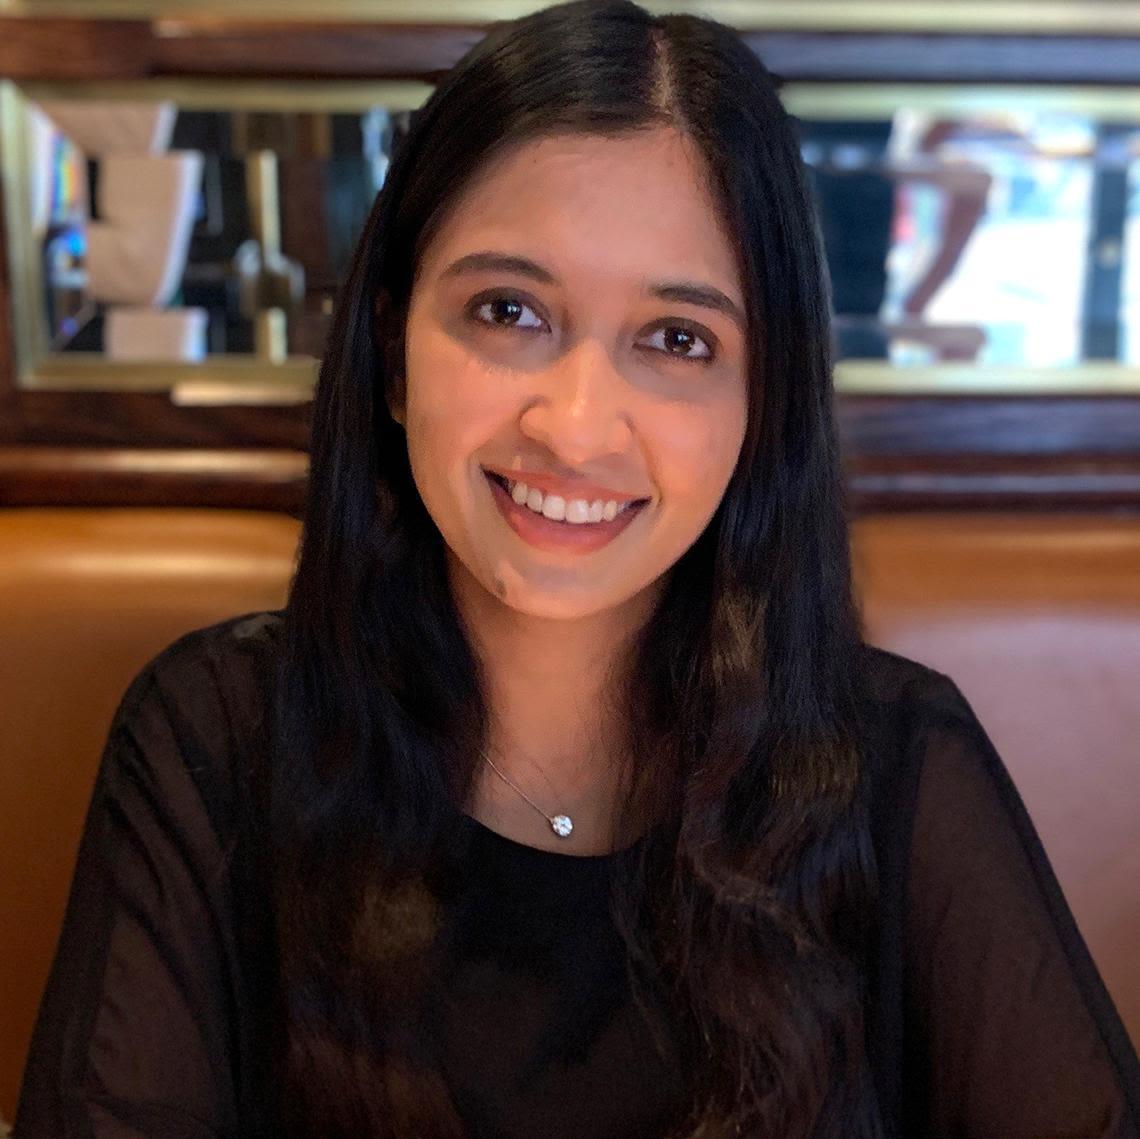 Avni Gupta